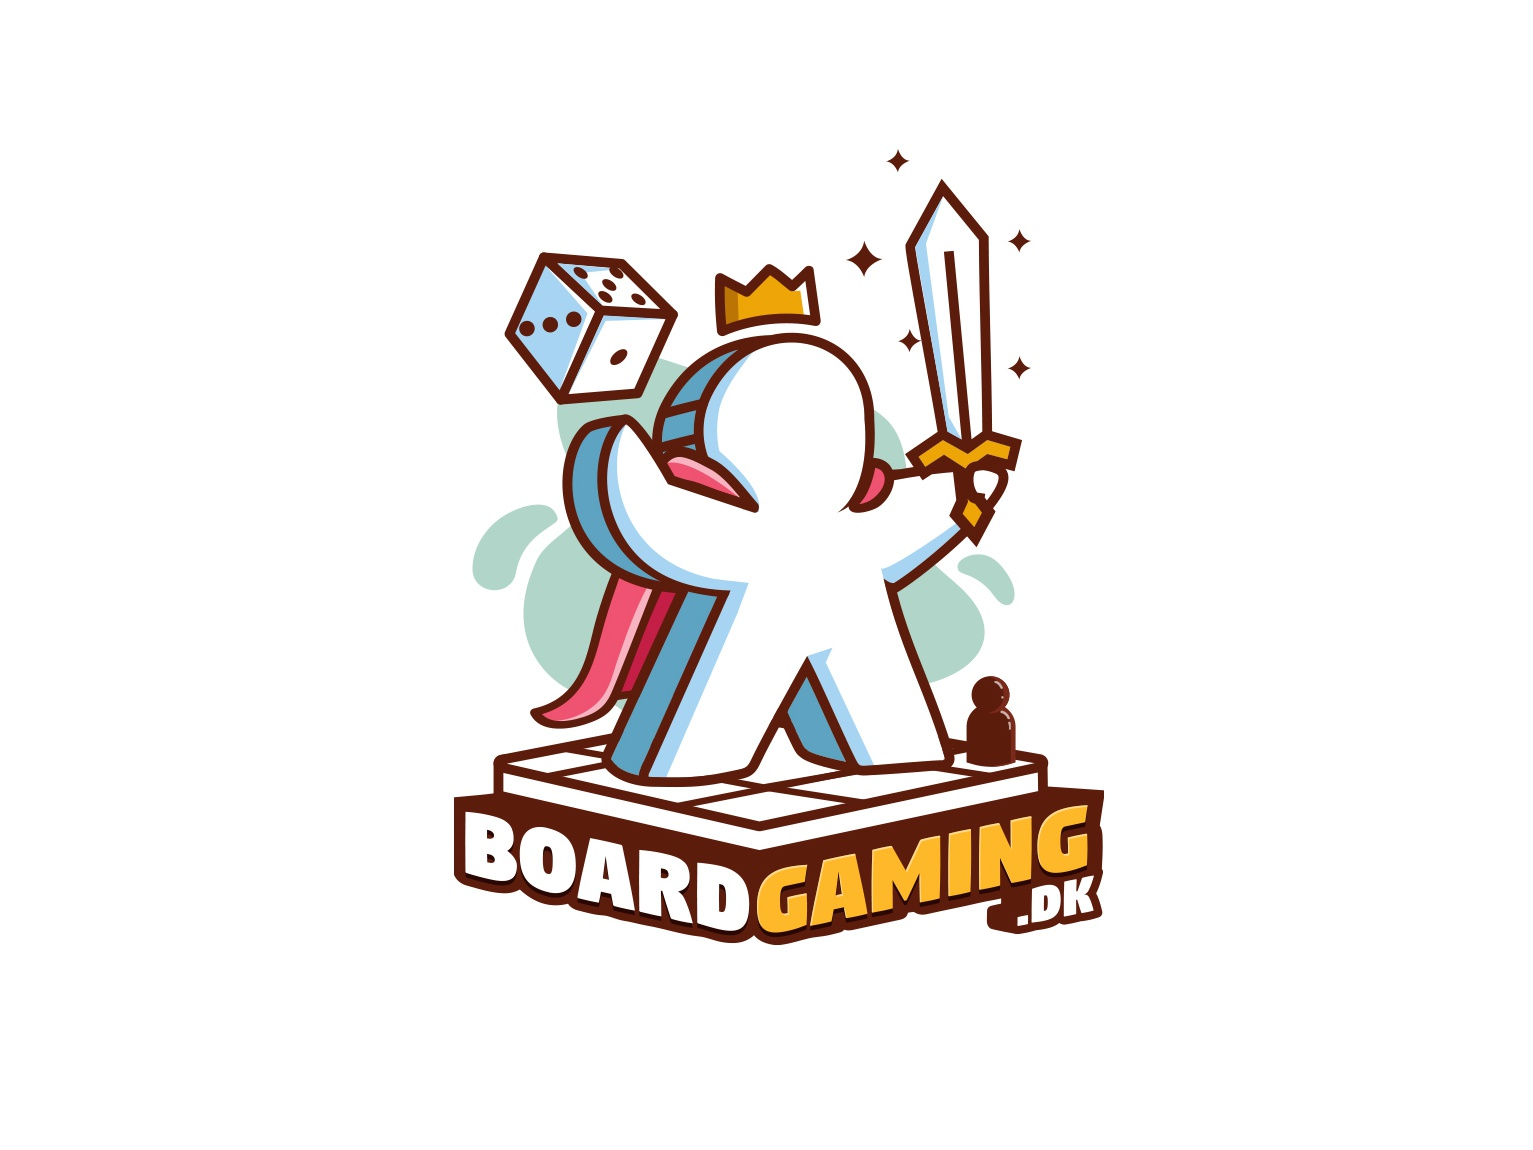 Boardgame studio logo game logo sketch logo cartoon logo logo design branding boardgames logo boardgame